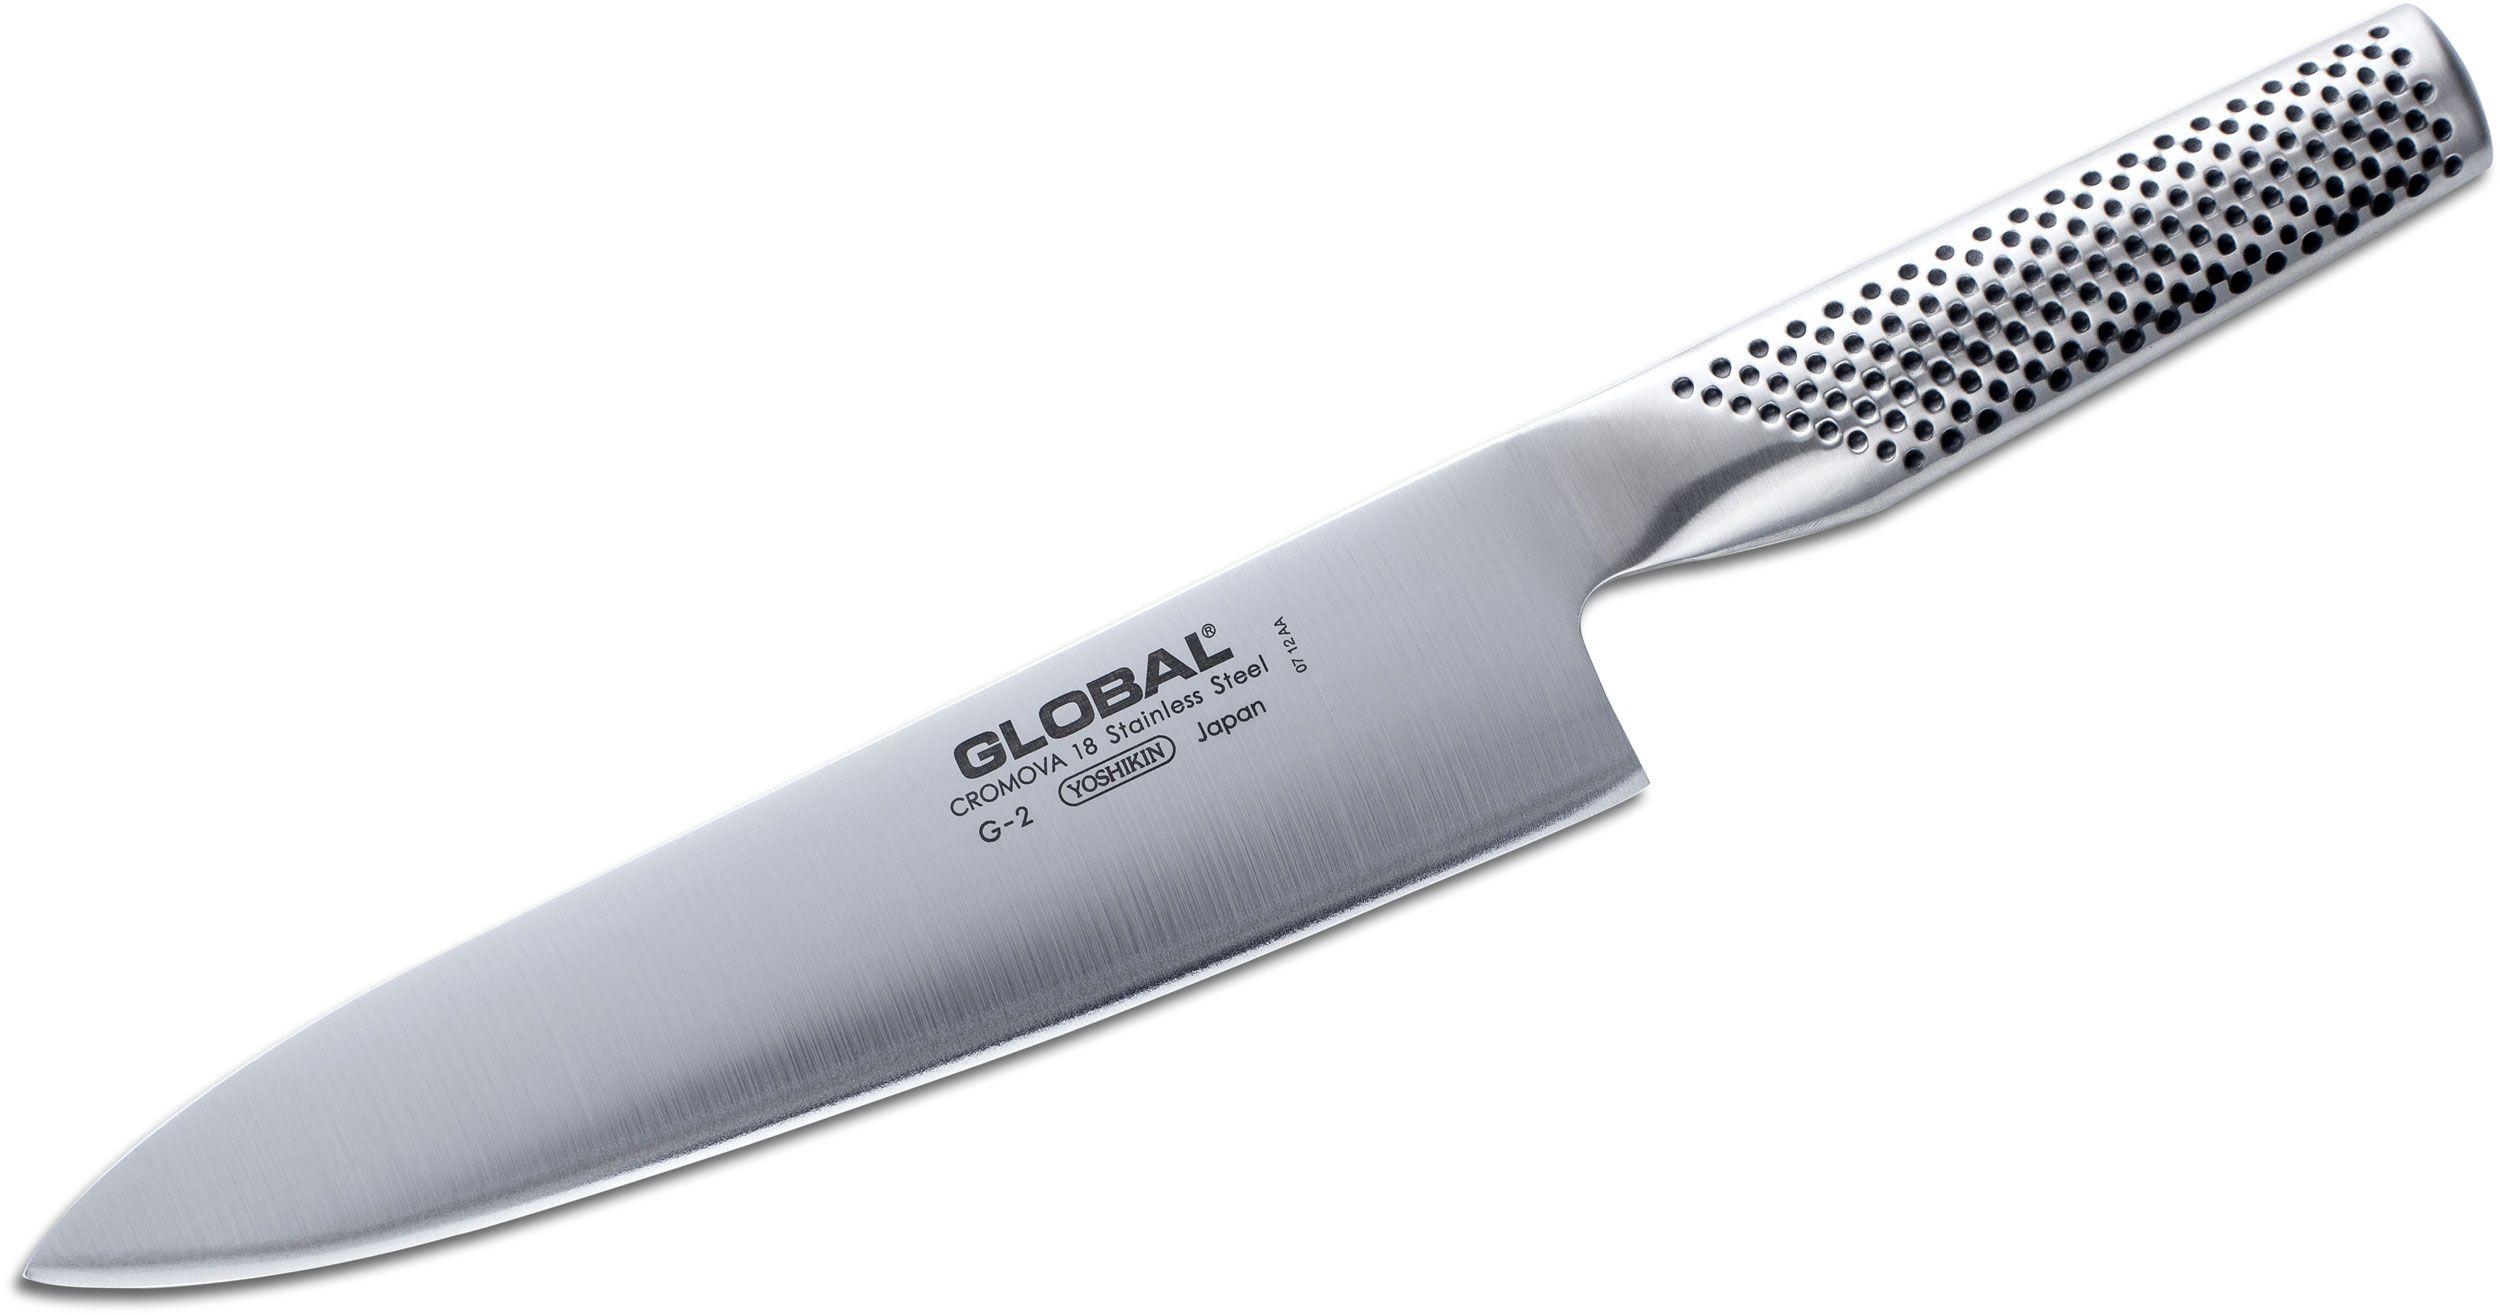 Global G-2 Classic 8 inch Chef's Knife